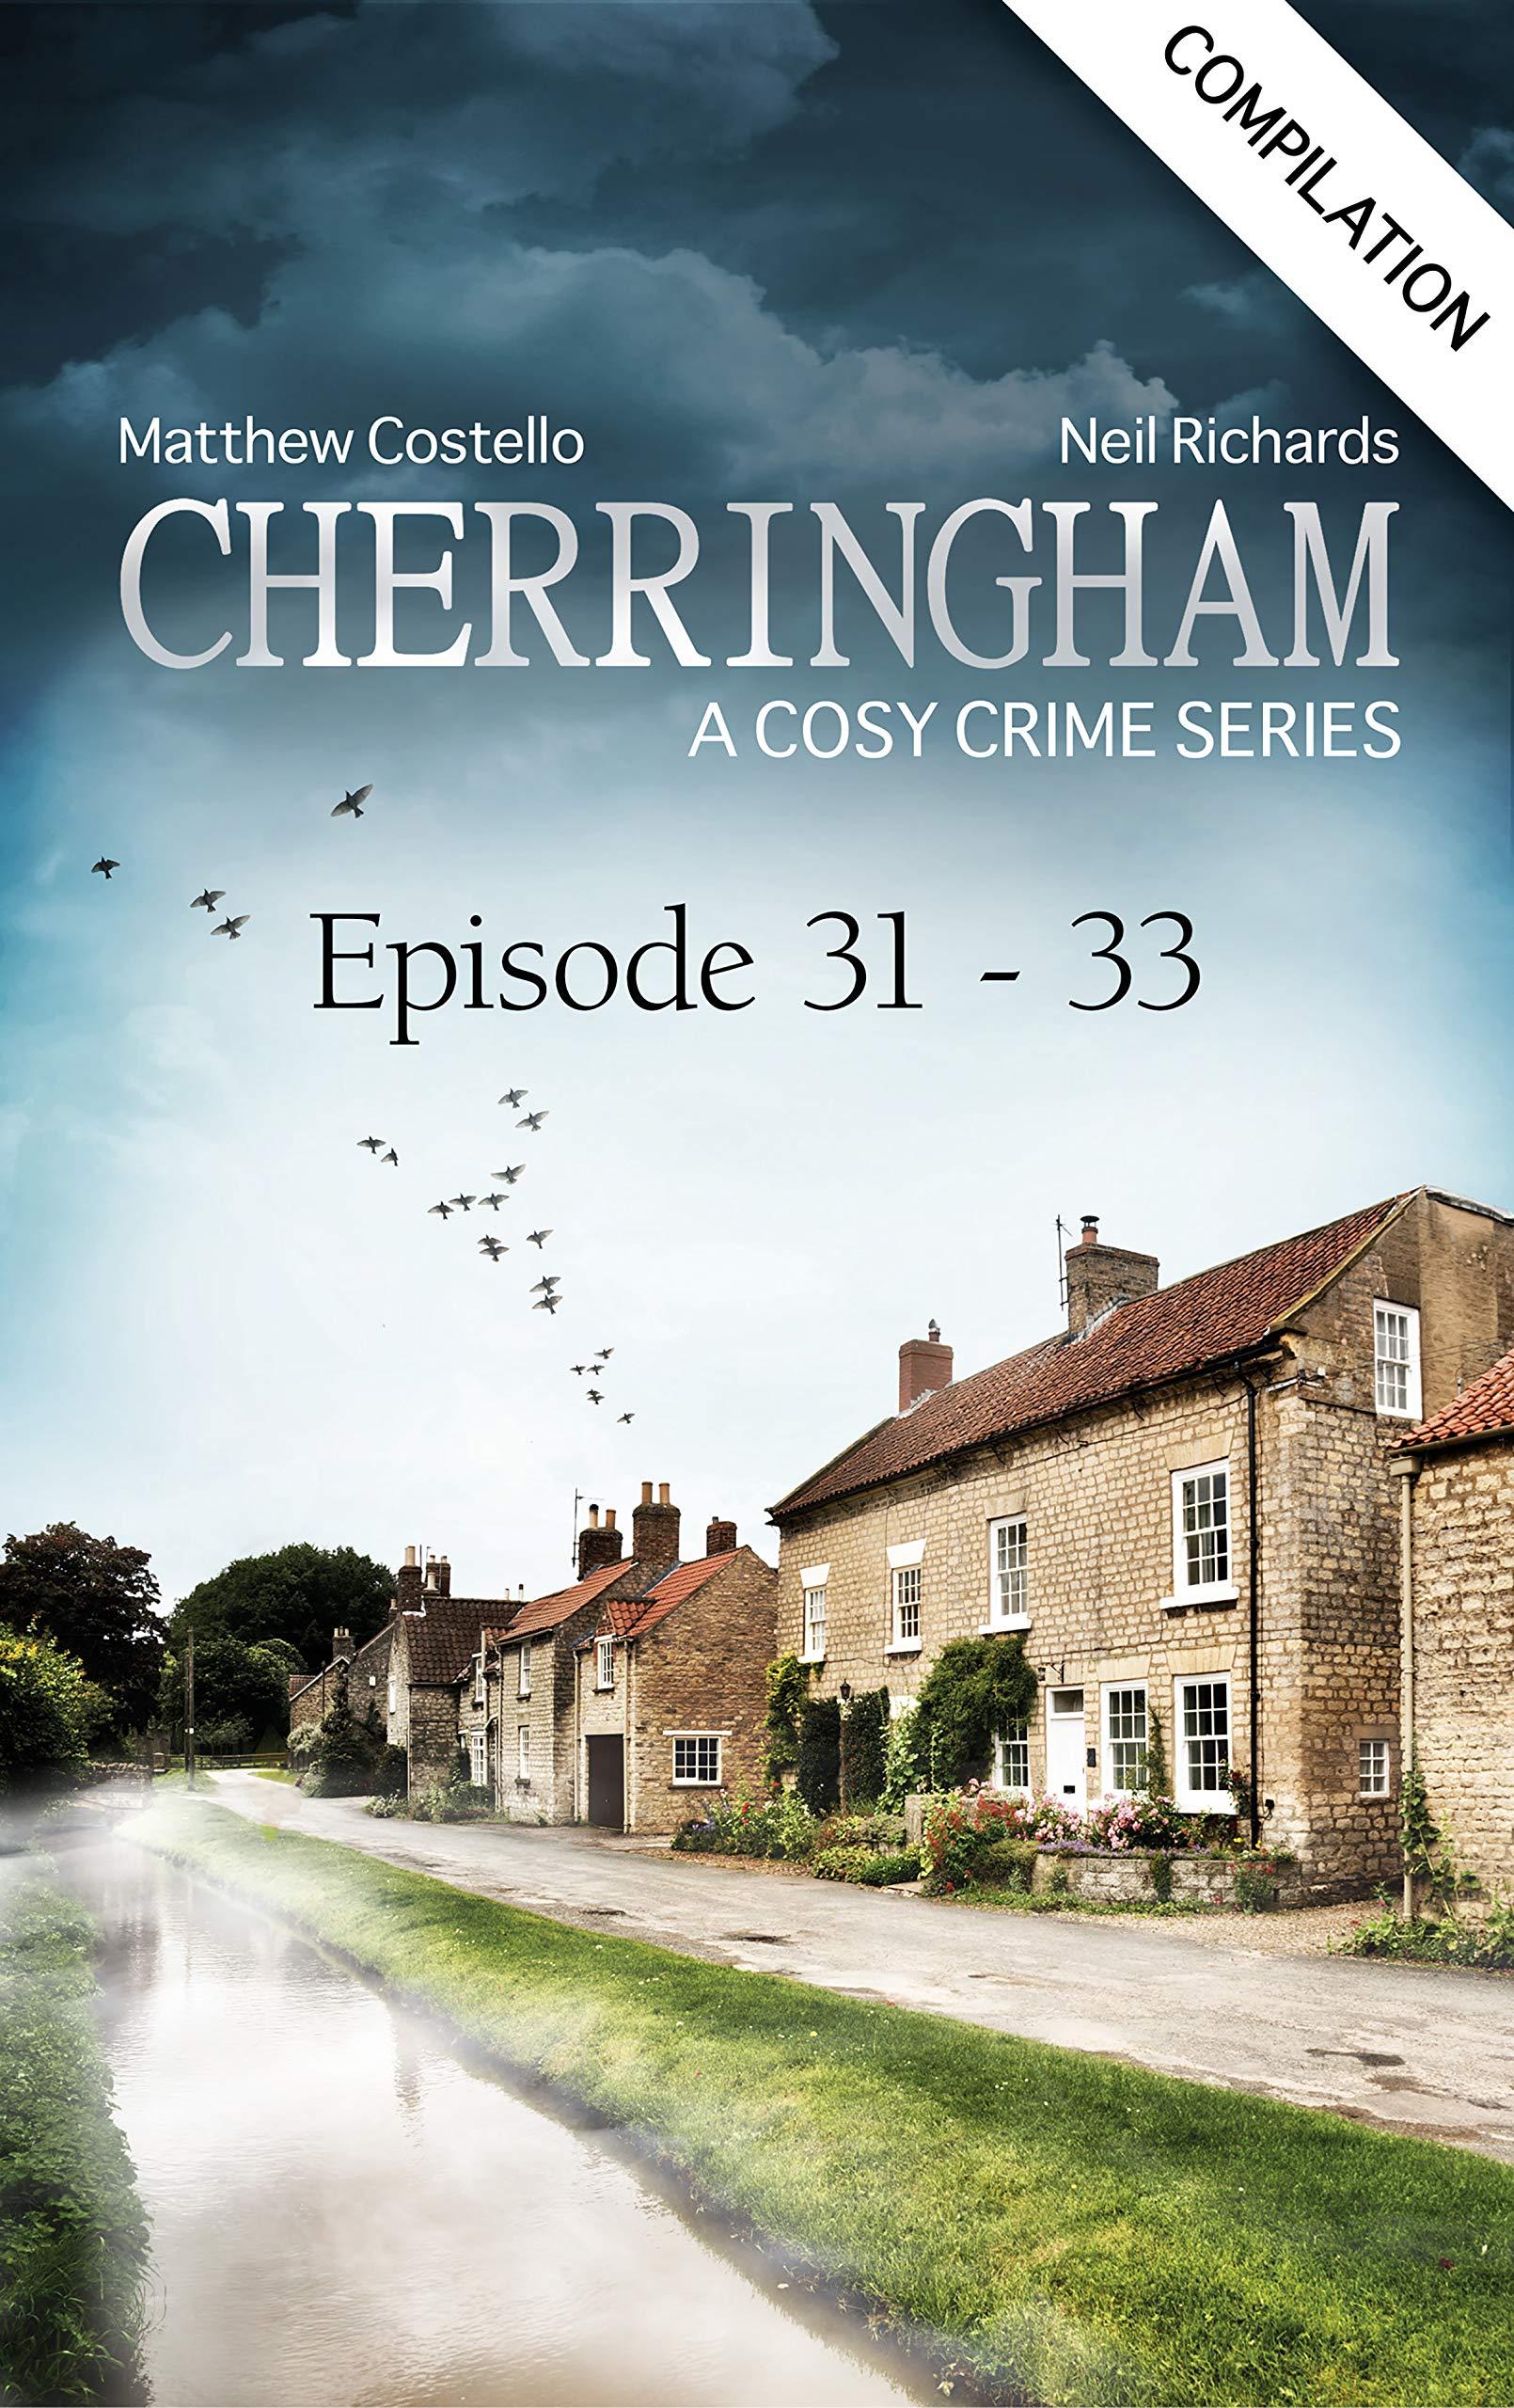 Cherringham - Episode 31-33: A Cosy Crime Compilation (Cherringham: Crime Series Compilations Book 11)